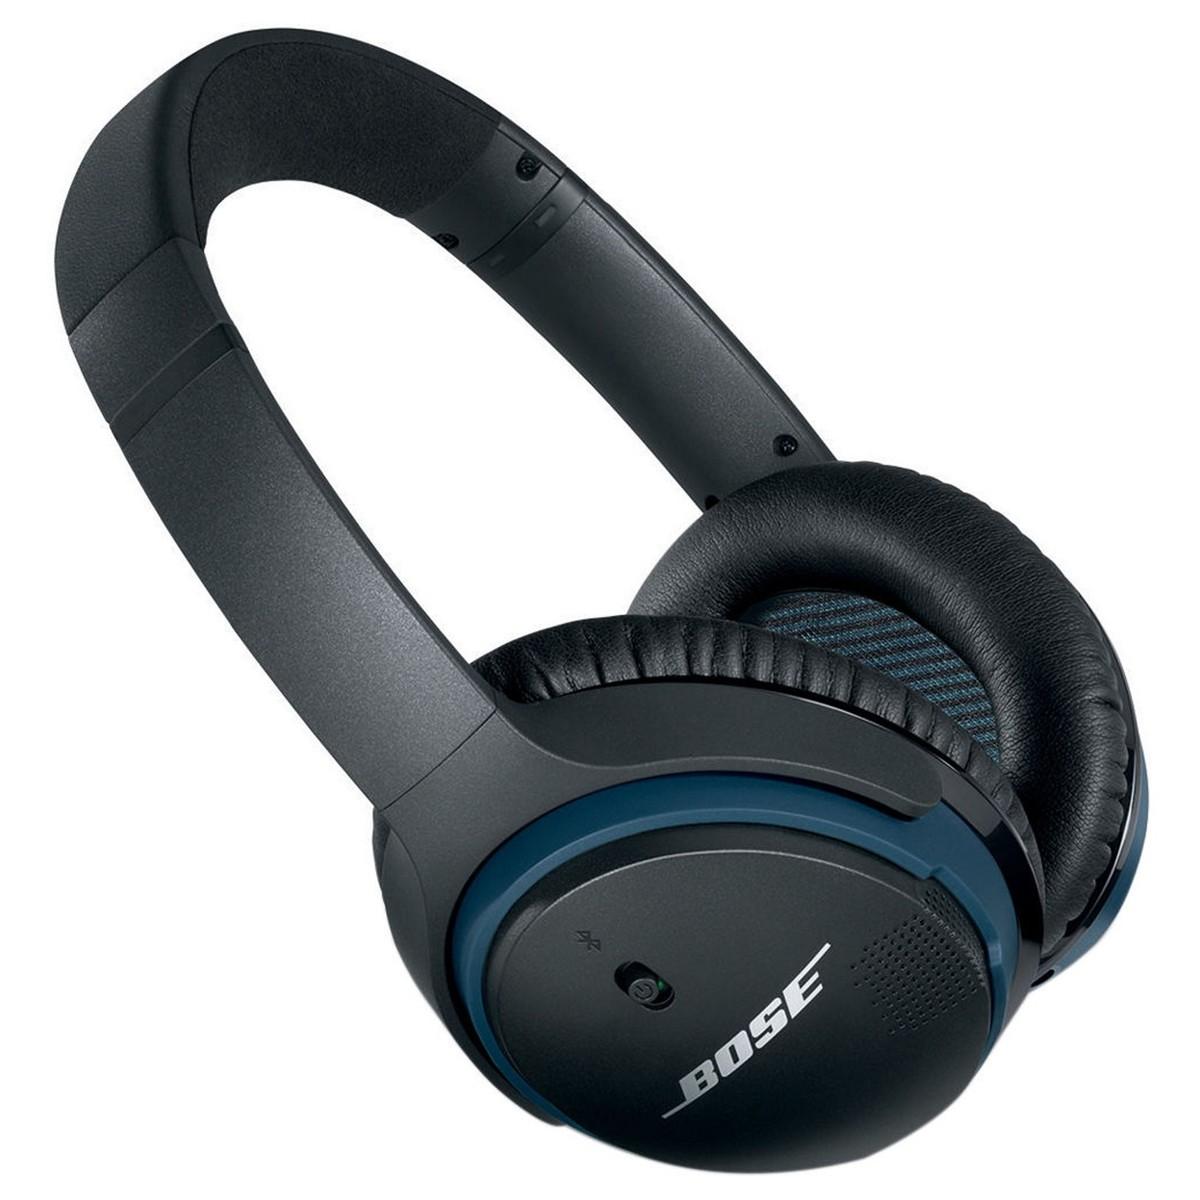 Bose SoundLink Around-Ear Bluetooth Headphones, Black at